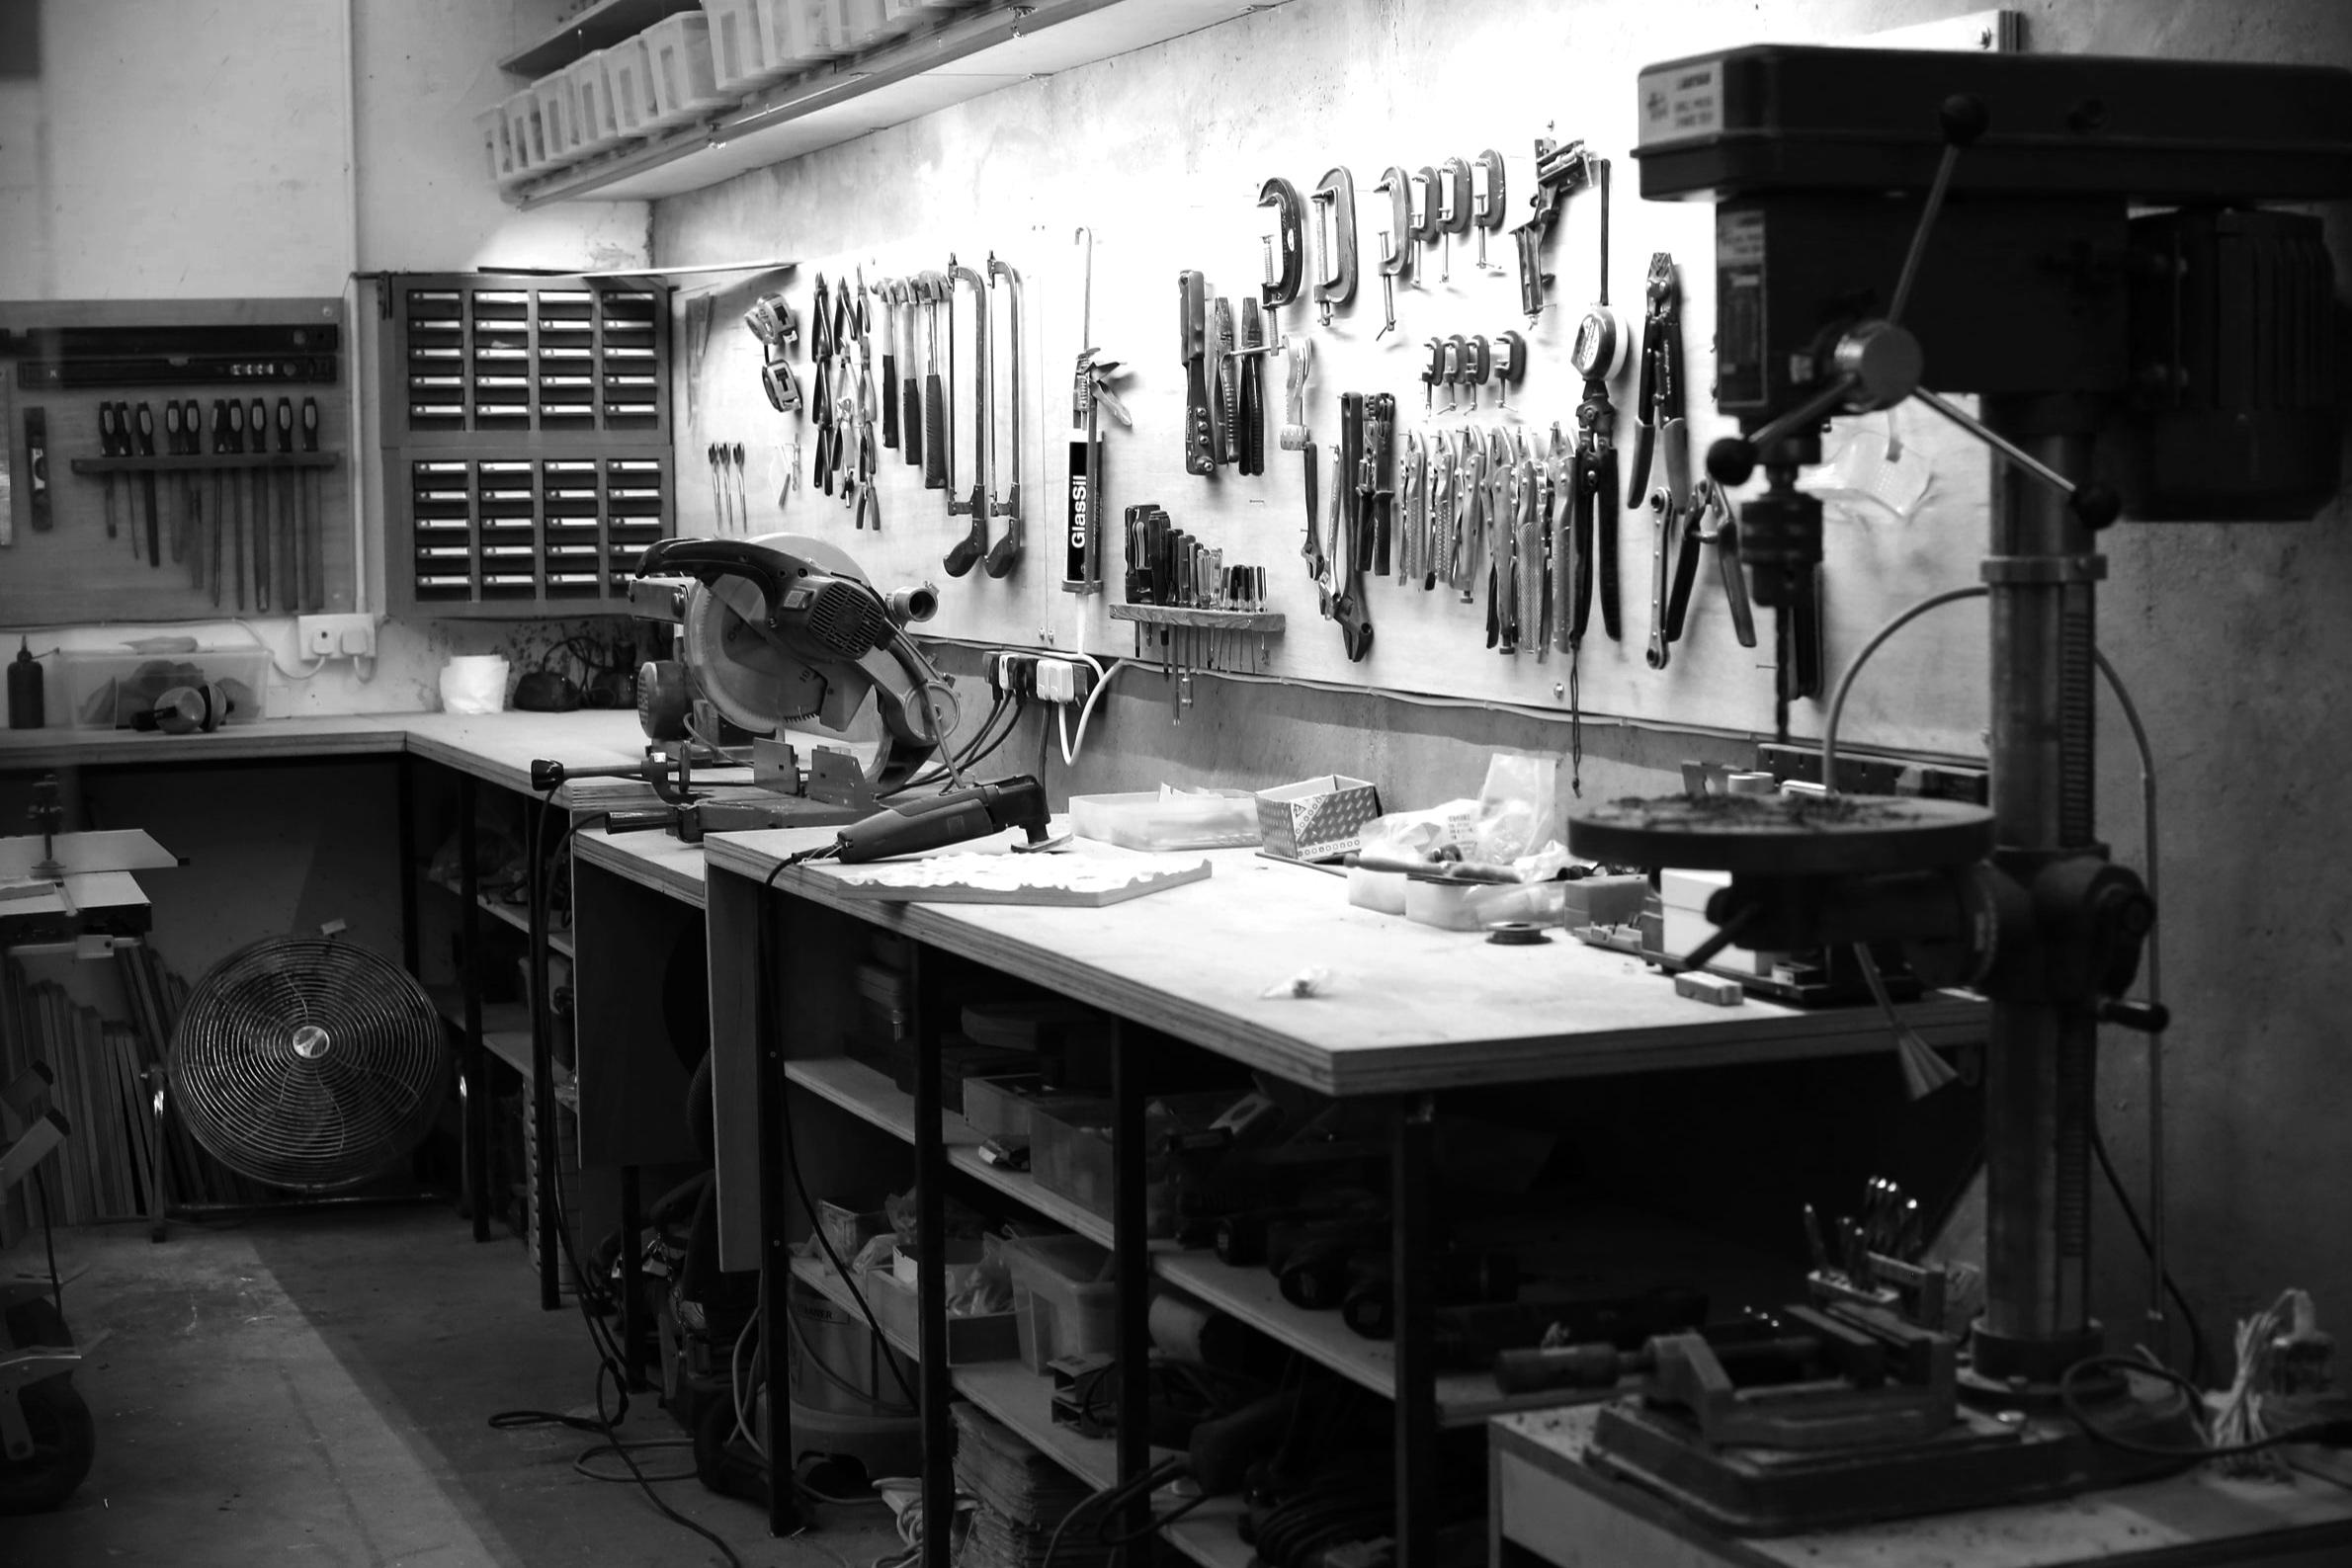 Work Bench & Tools.JPG